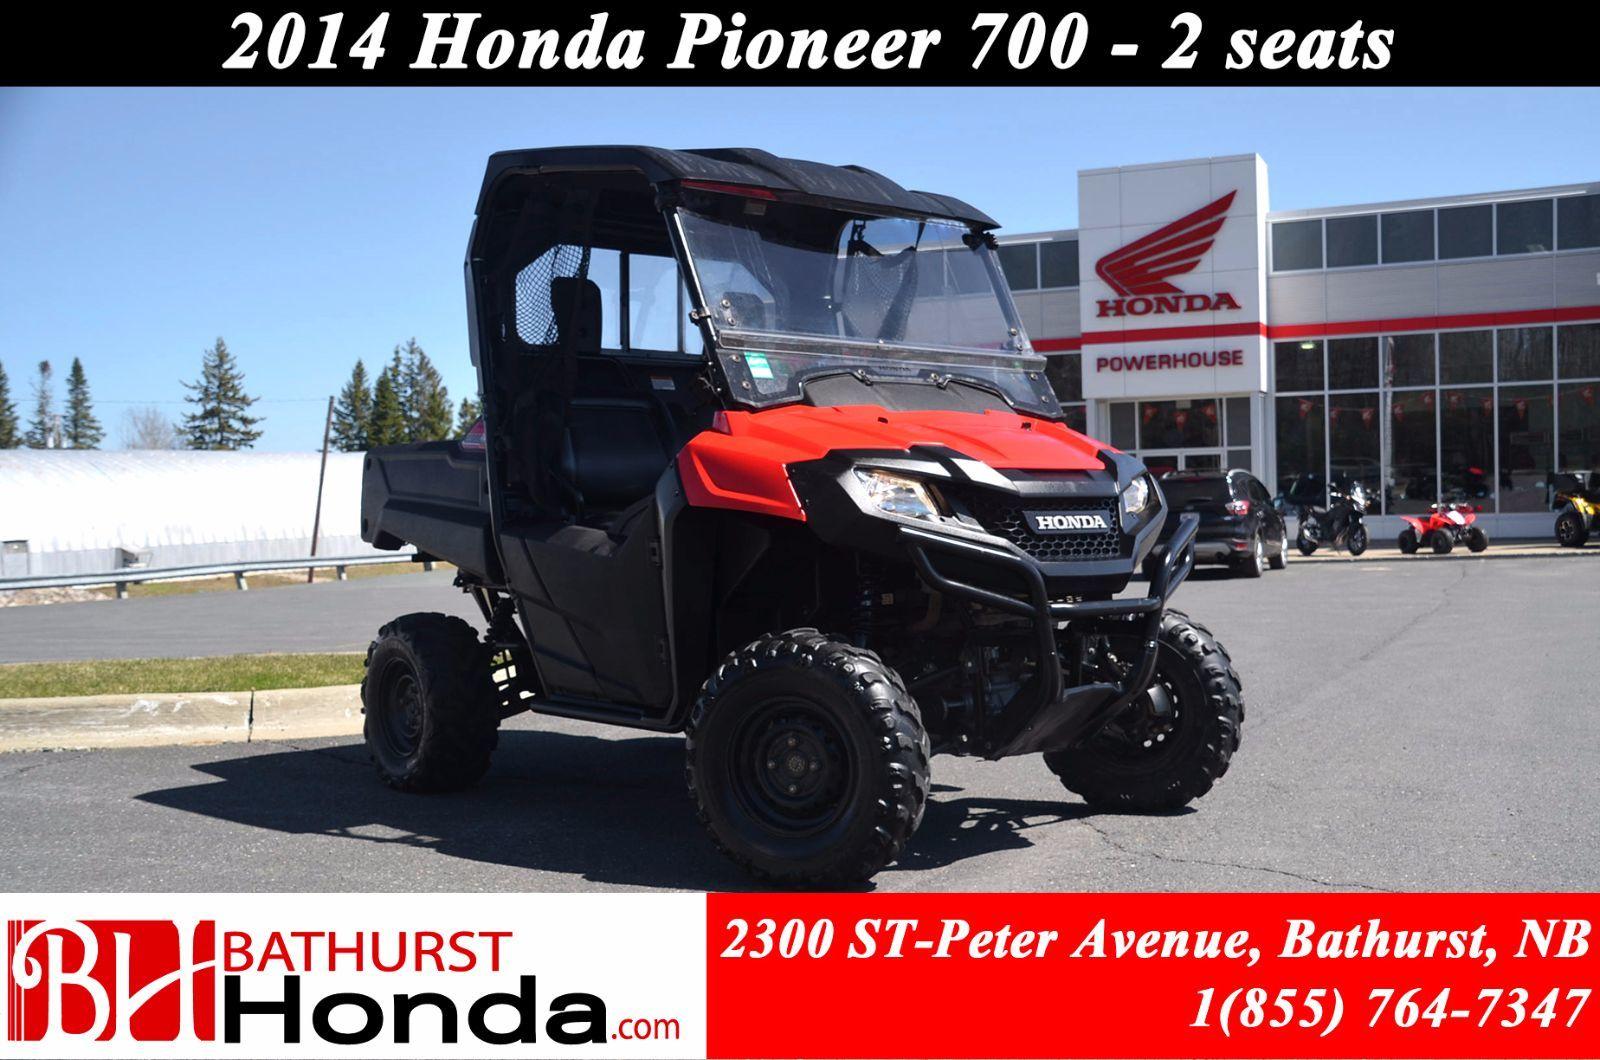 Used 2014 Honda Pioneer 700 2 Seats At Bathurst Honda